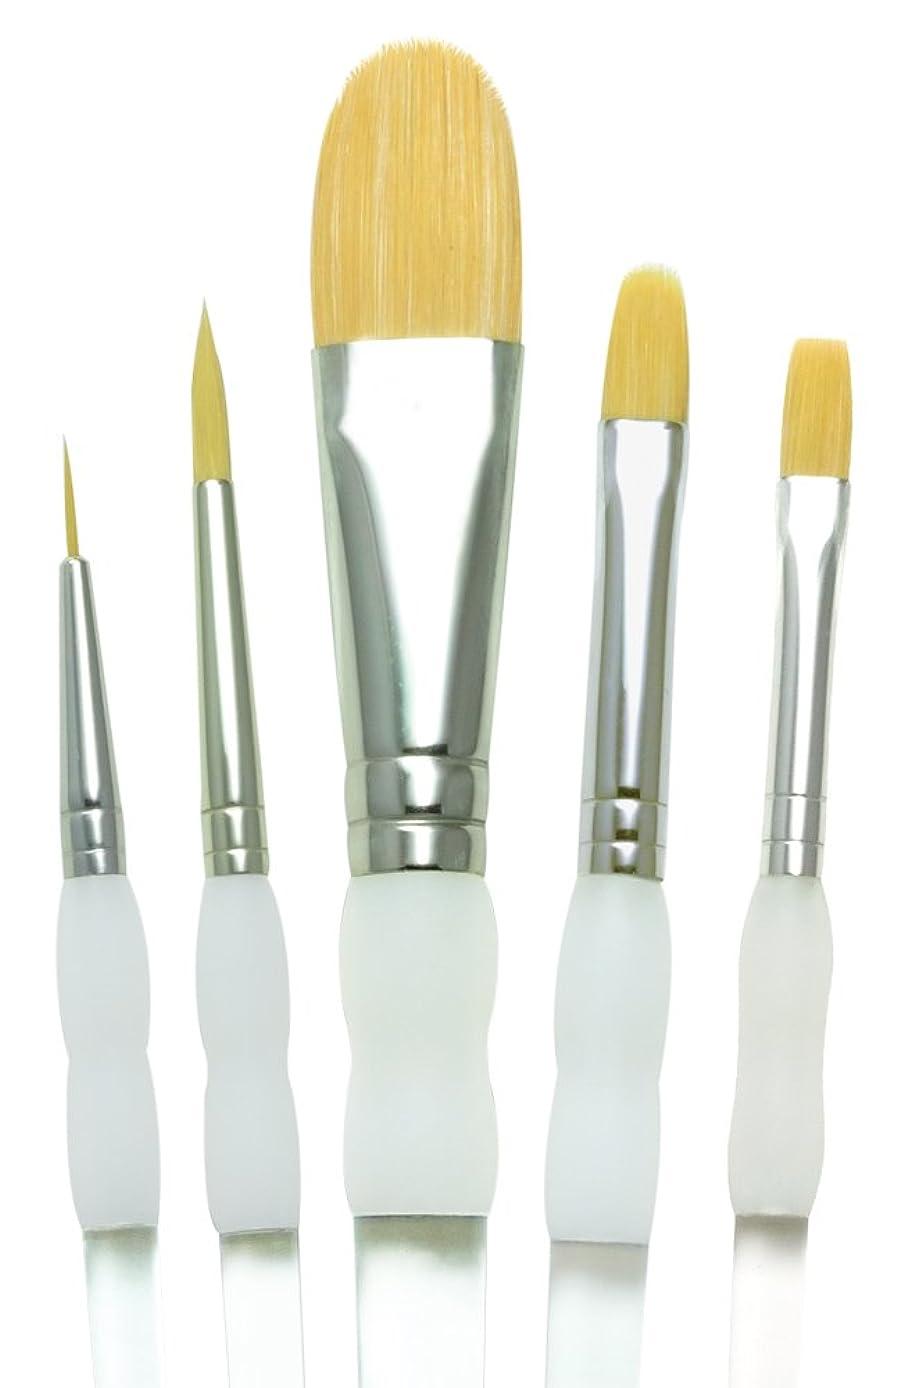 Royal Brush 408548 10014044 Soft Grip Starter Golden Taklon Fiber Paint Brush Set Assorted Size Multicolor 5